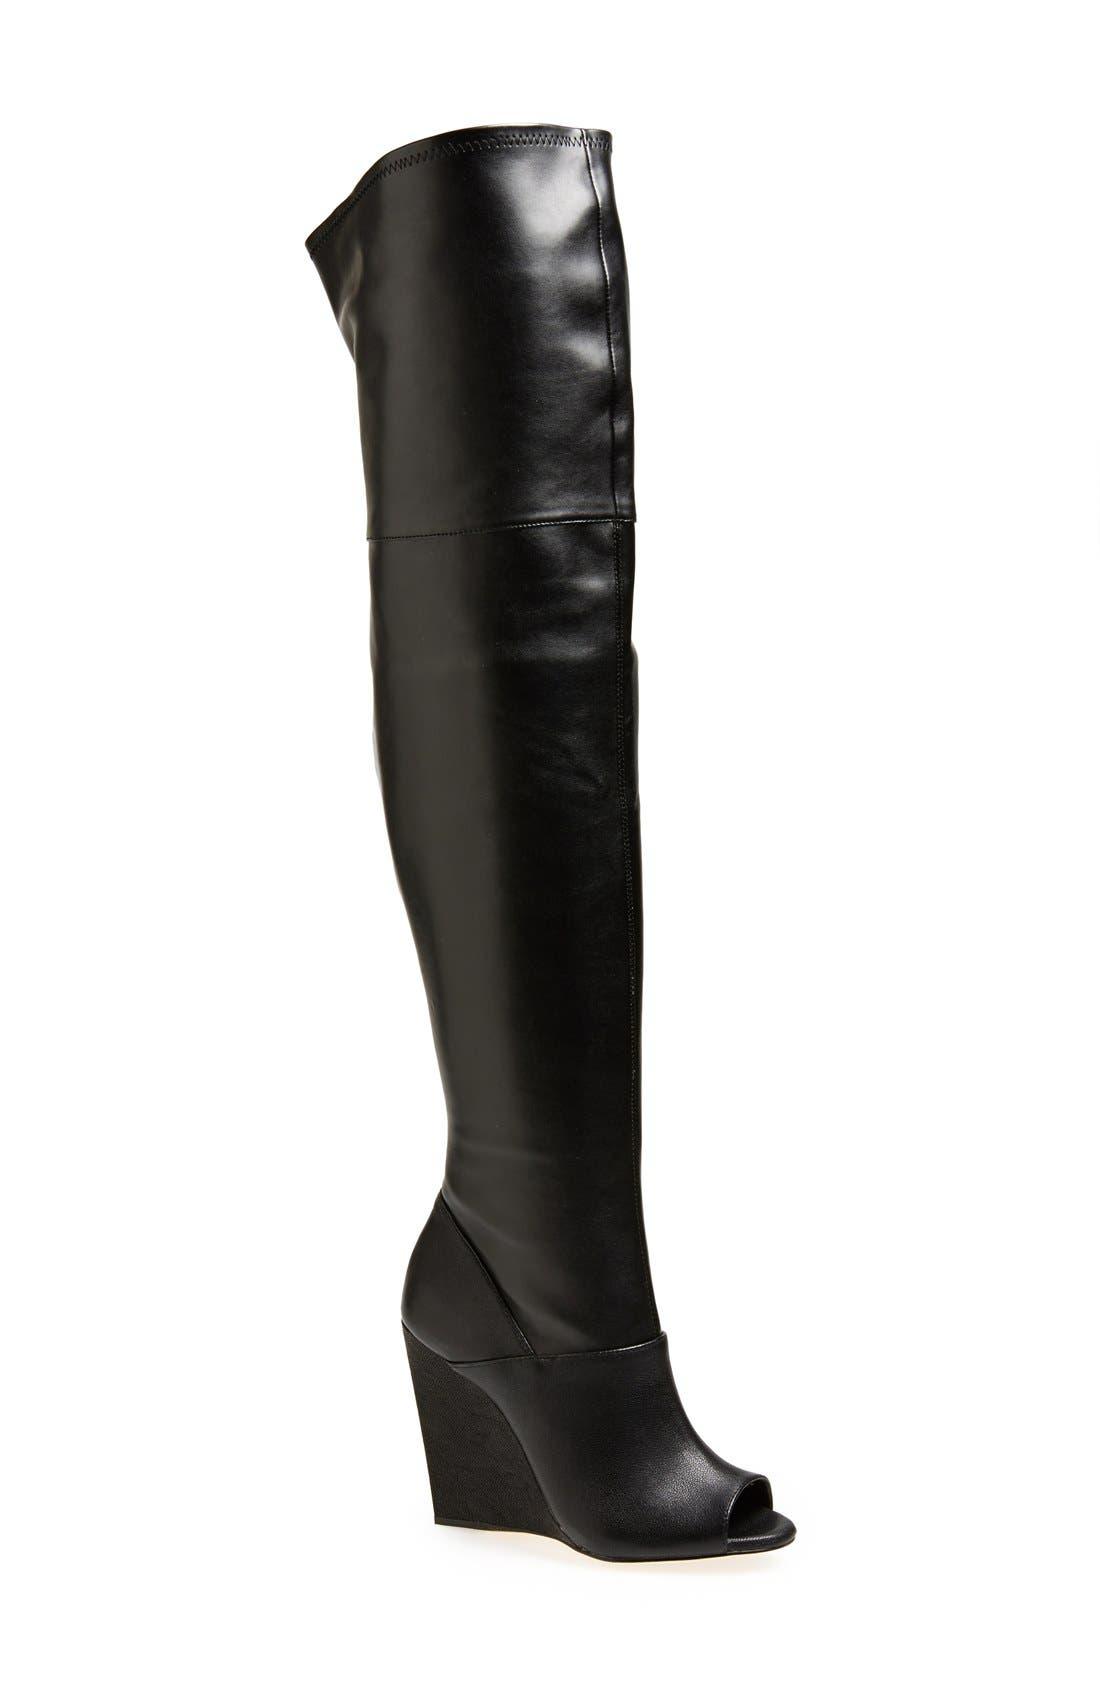 Main Image - BCBGMAXAZRIA 'Deanna' Over the Knee Leather Peep Toe Boot (Women)